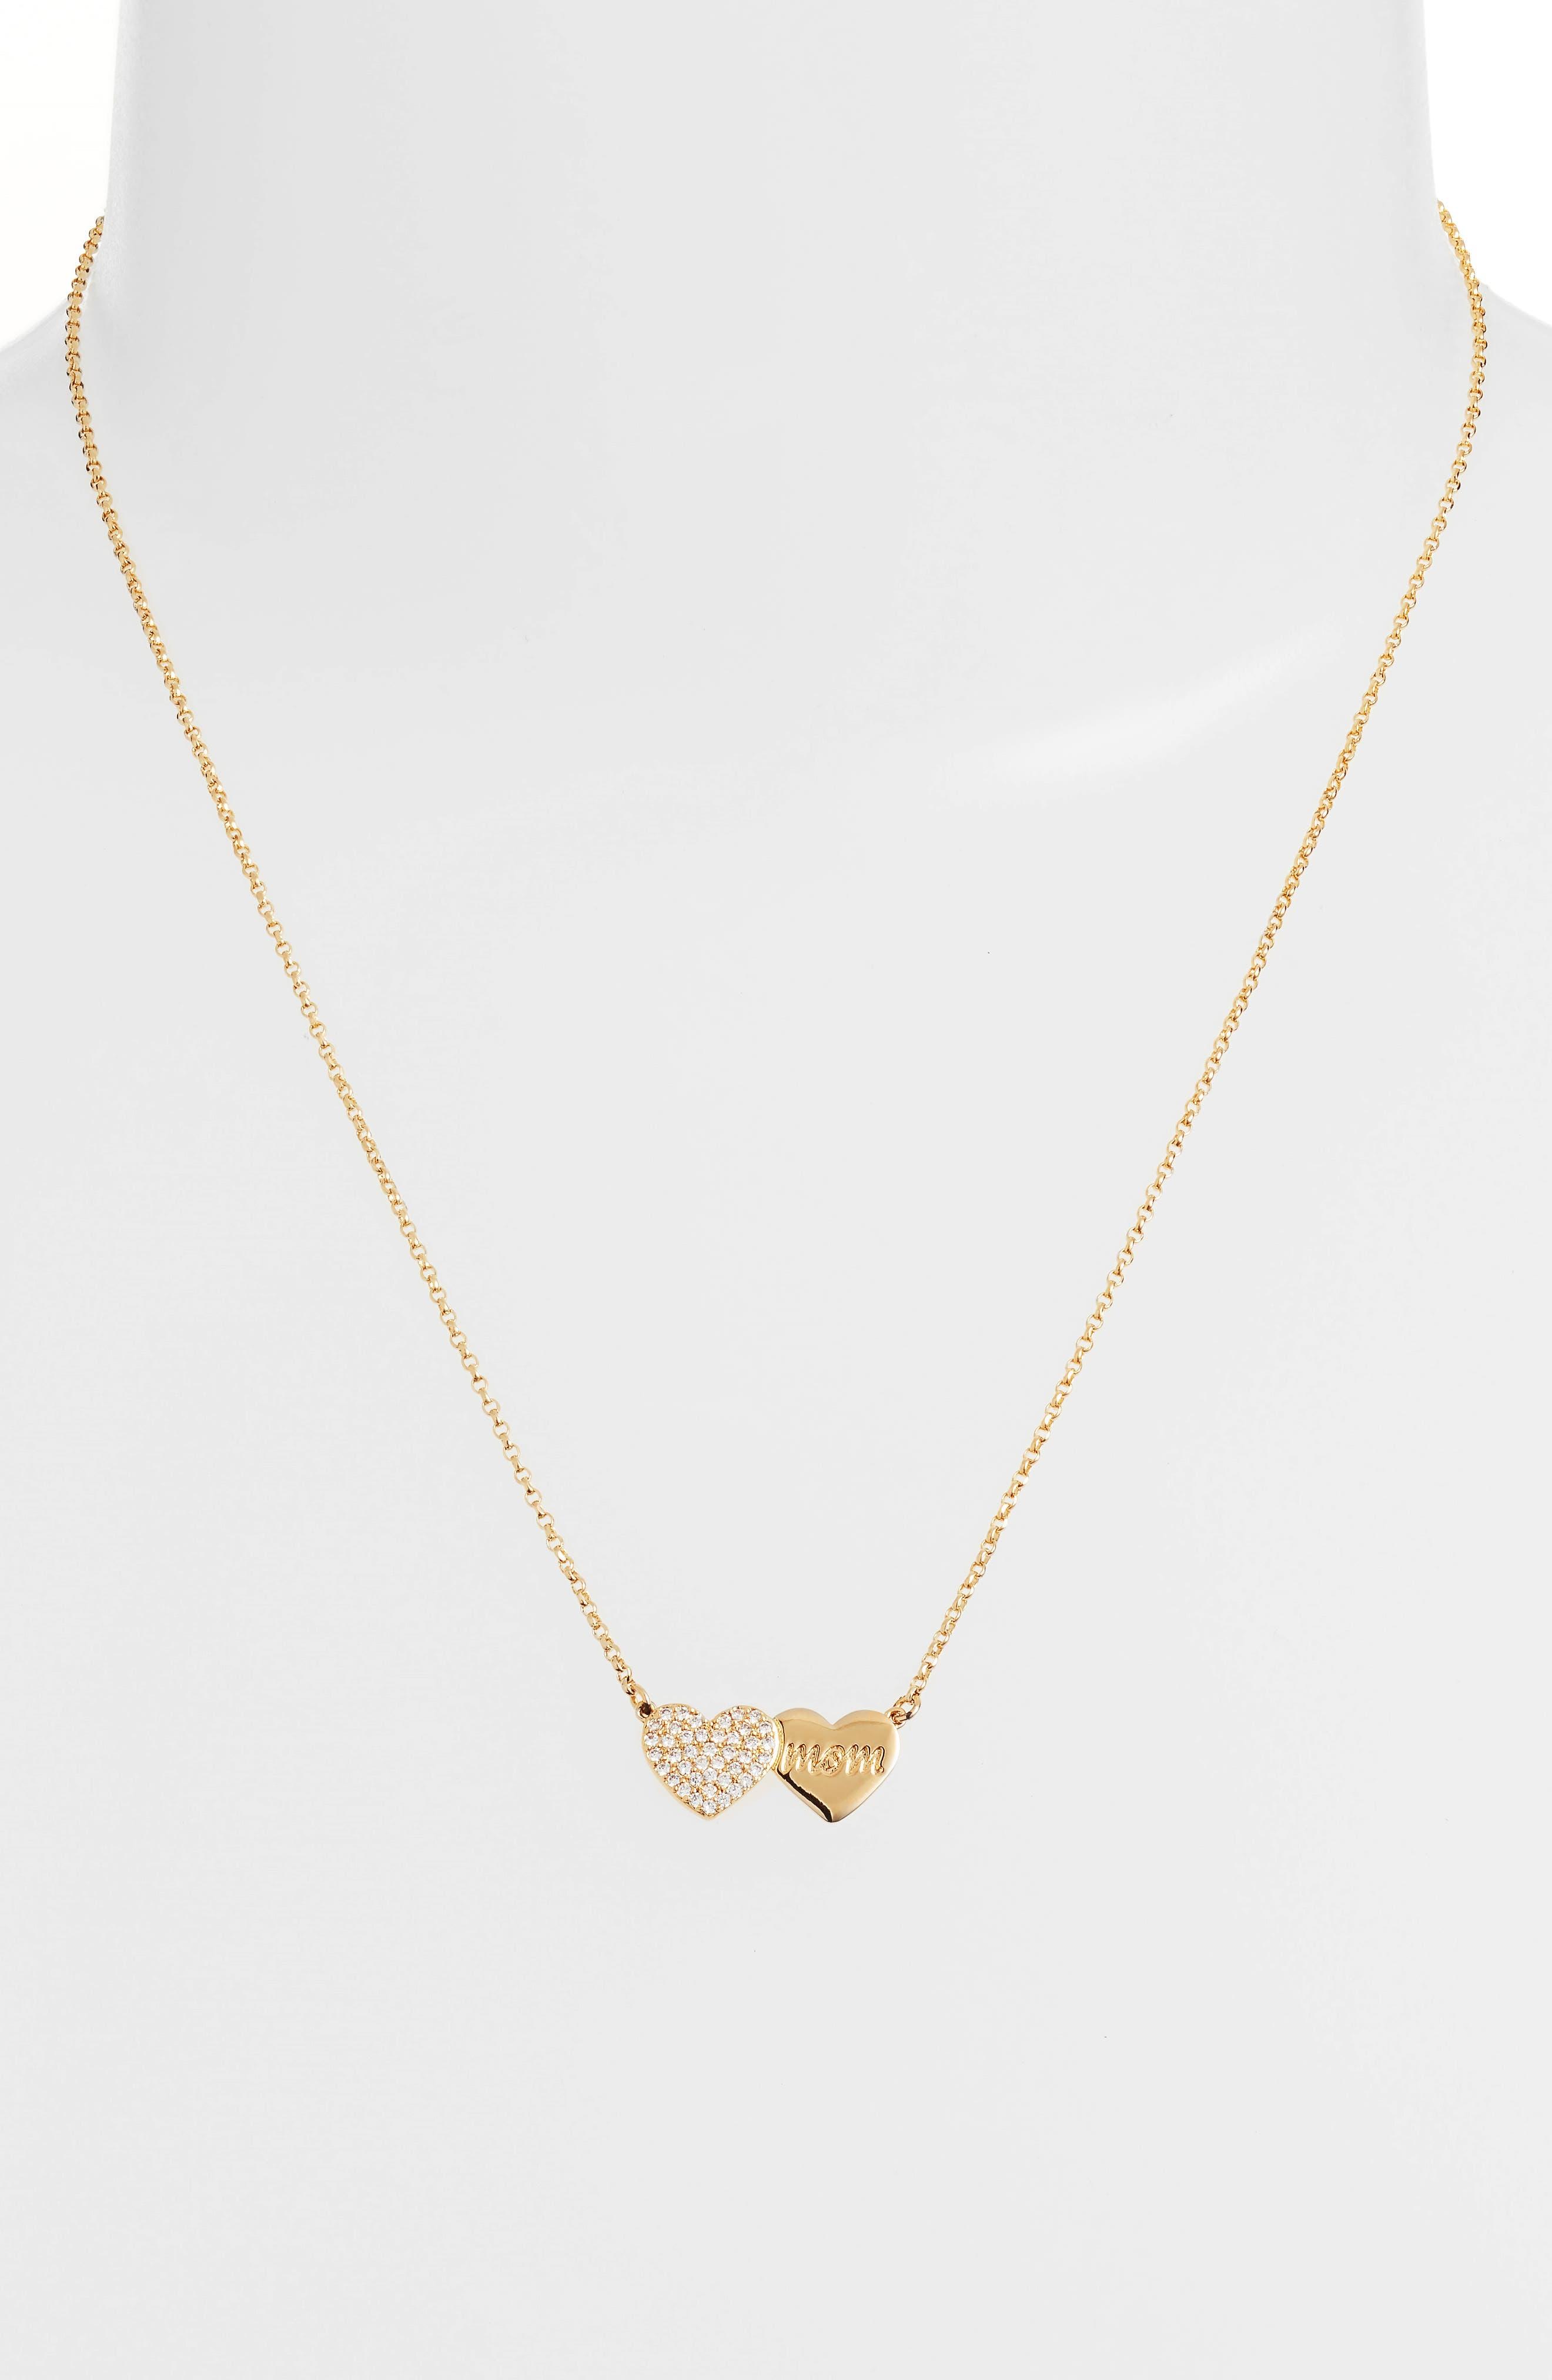 mom knows best pavé heart necklace,                             Alternate thumbnail 2, color,                             Gold